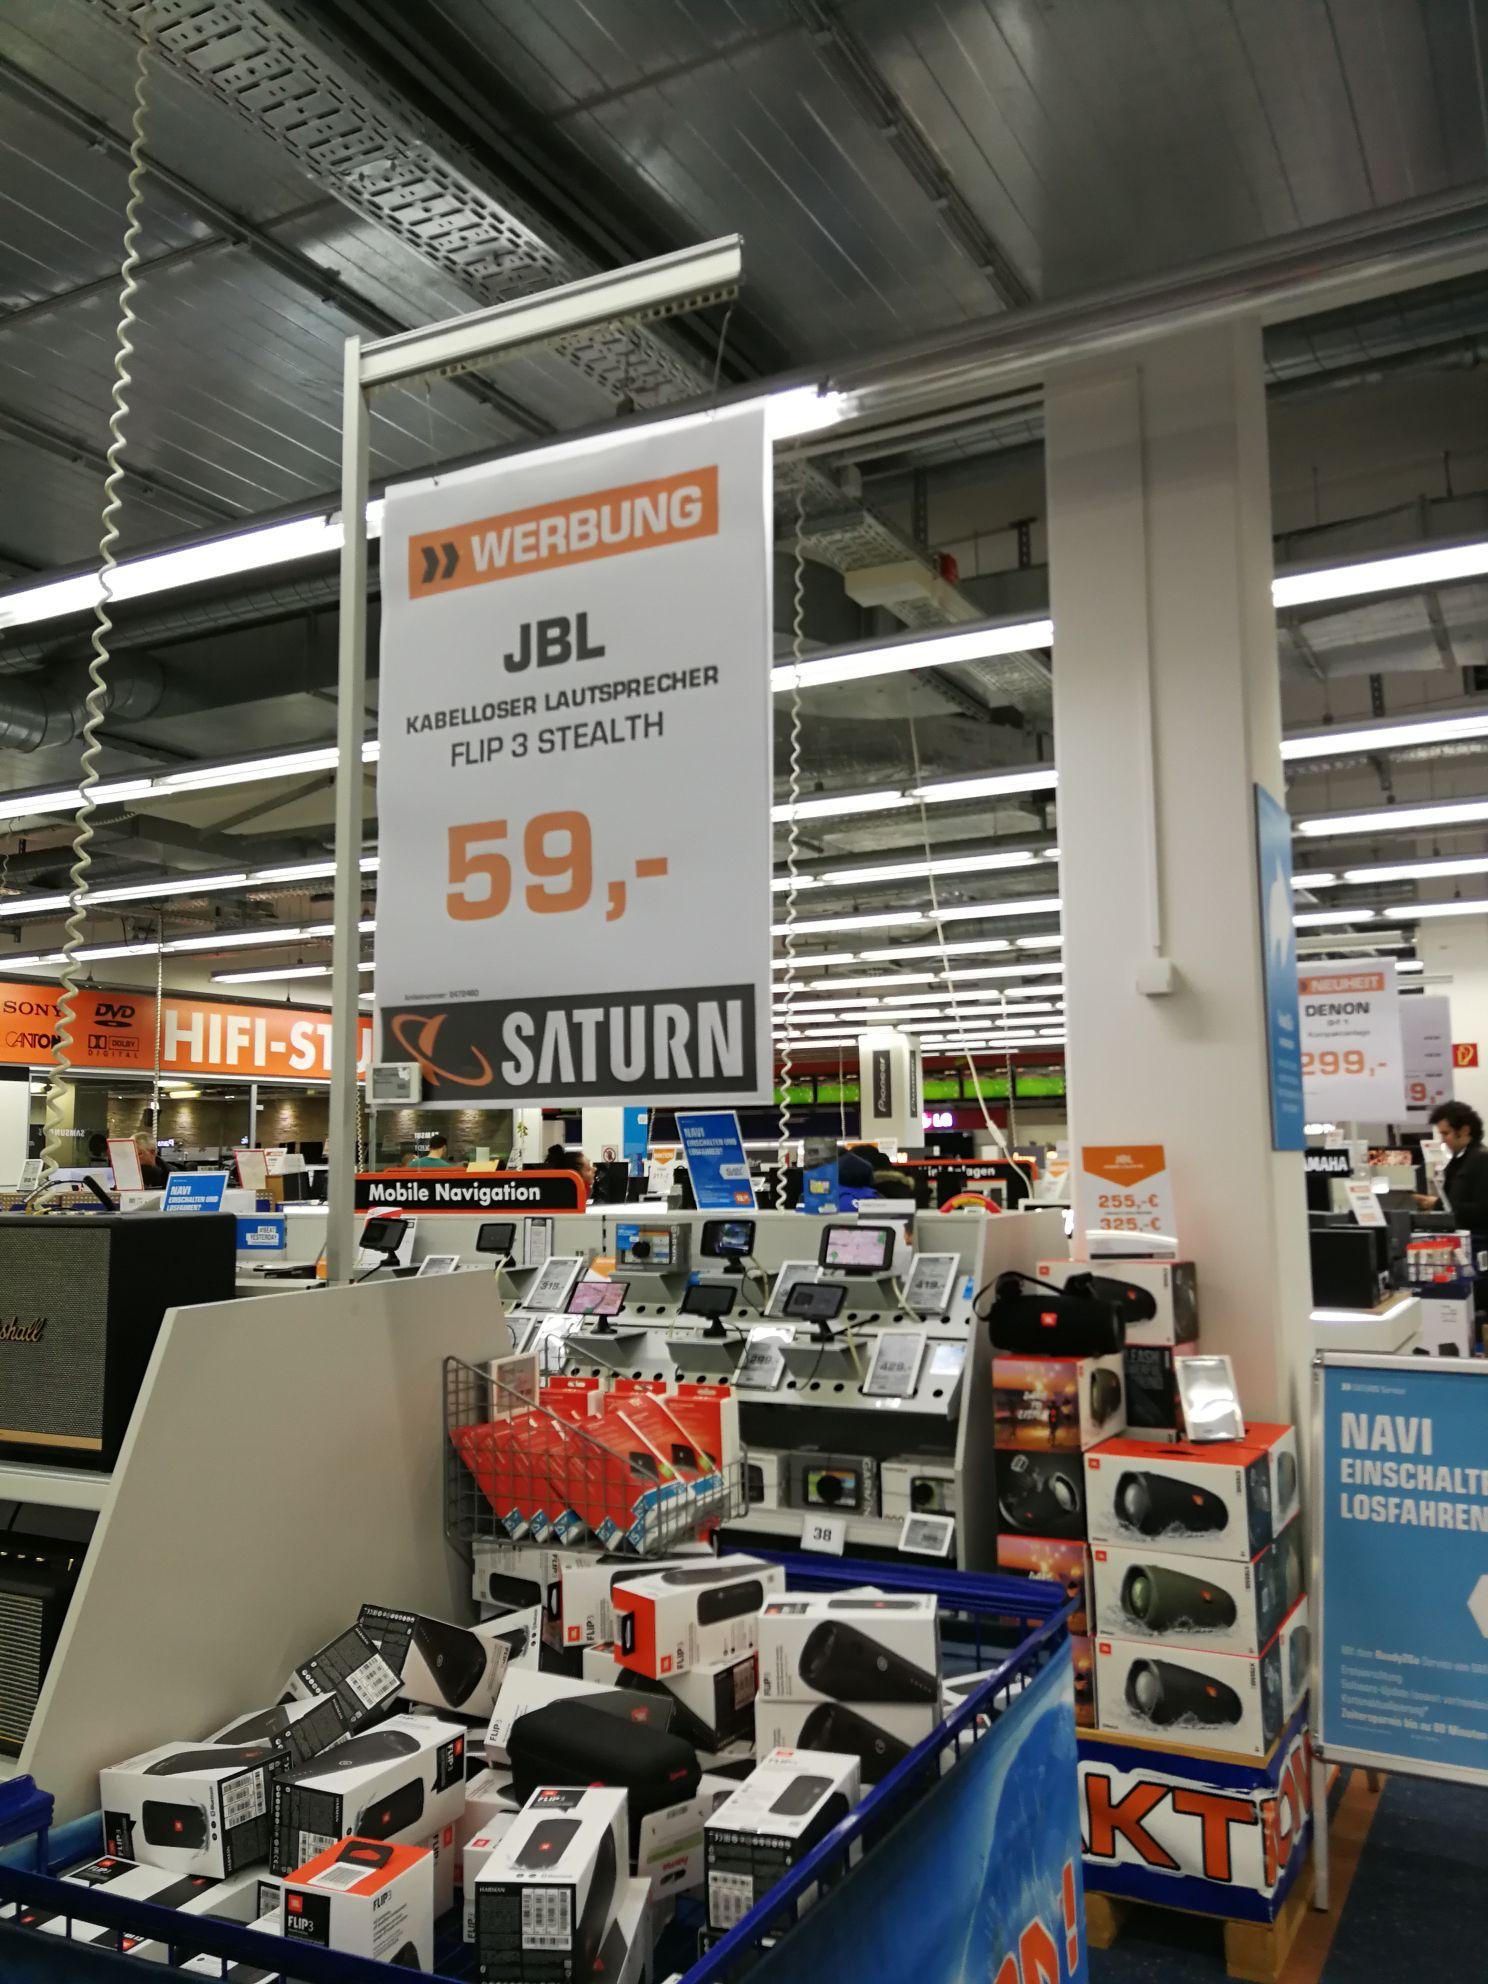 (Lokal Essen Saturn) JBL Flip 3 Stealth Edition